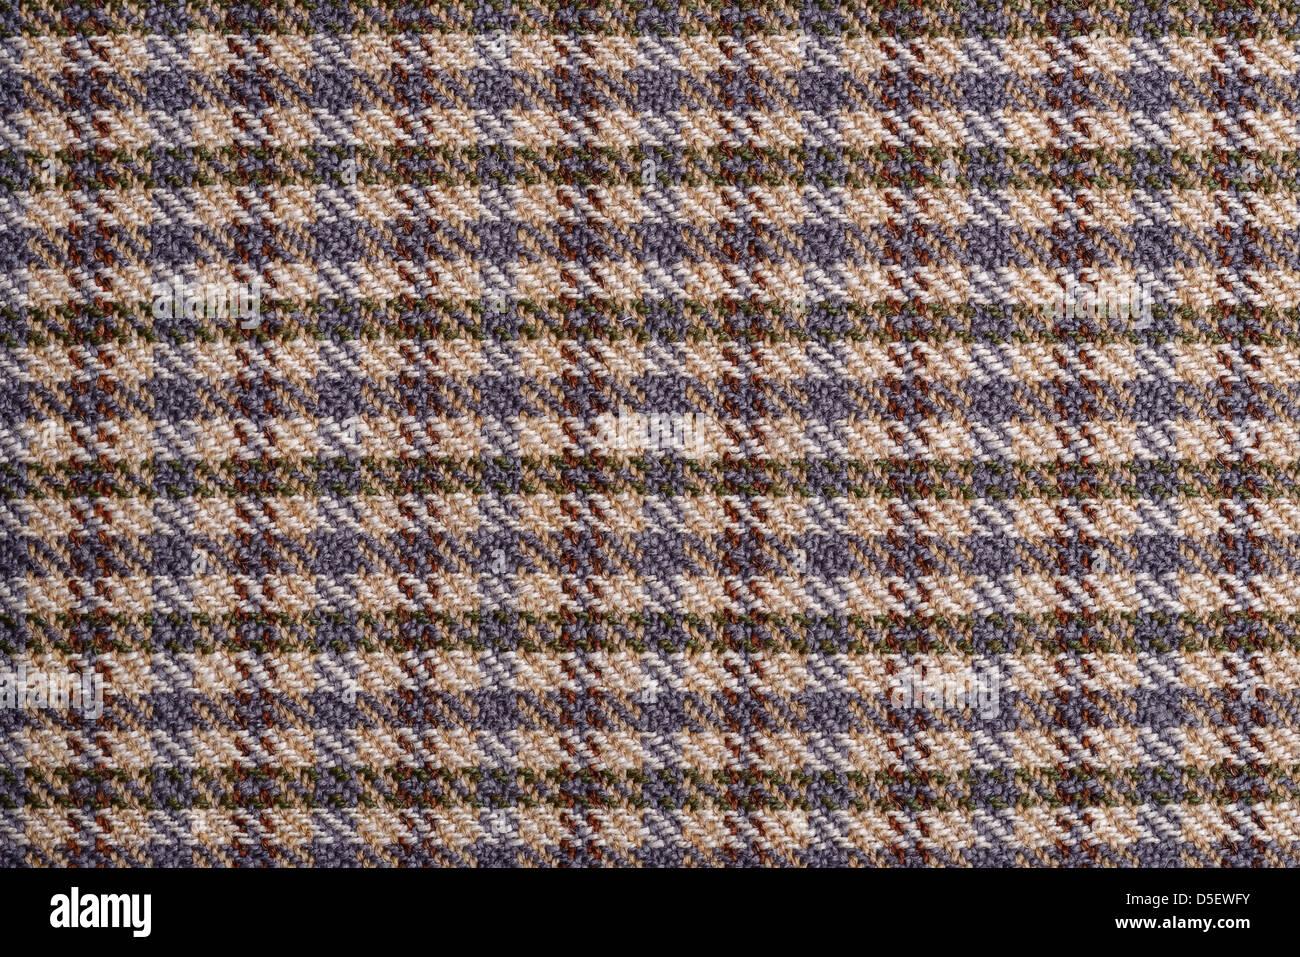 Lana tessuto tweed in dettaglio Immagini Stock